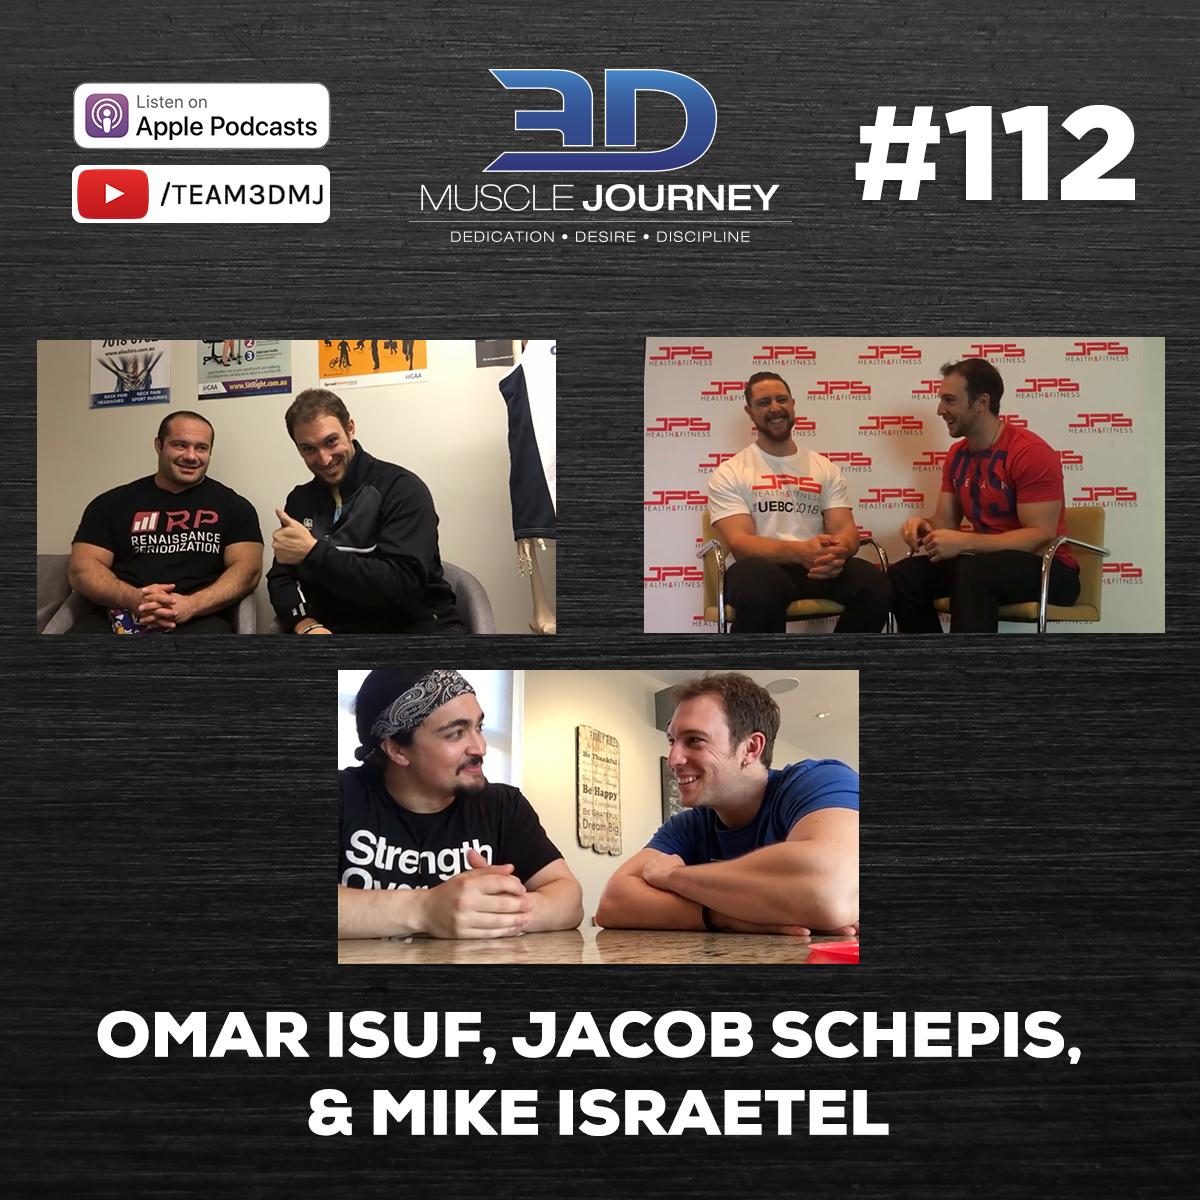 Best Episodes of 3D Muscle Journey